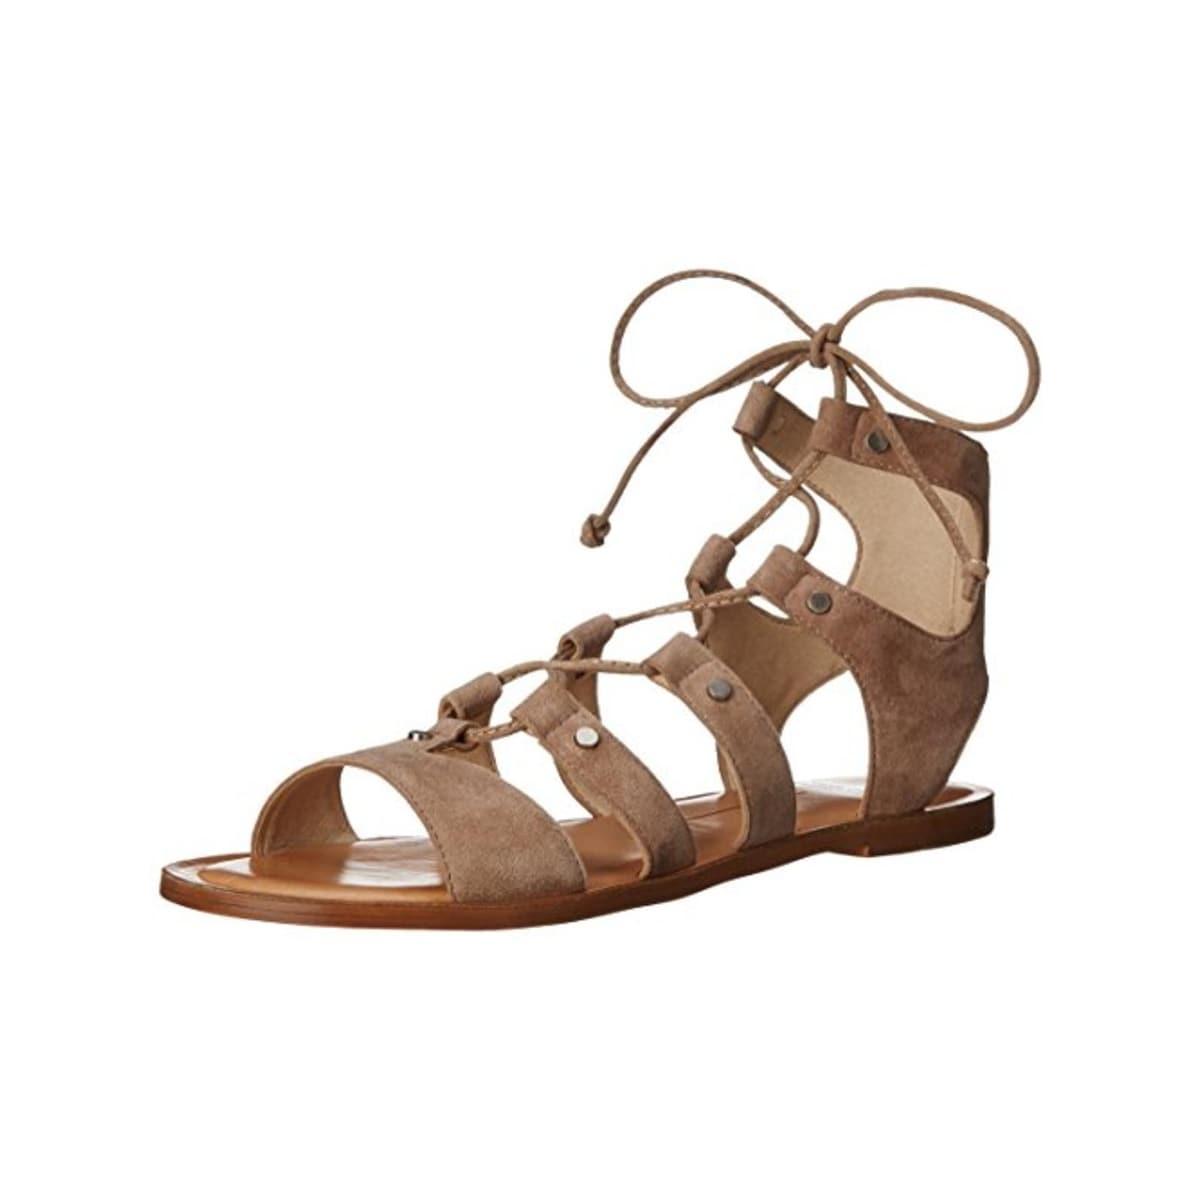 0700f0168c6 Buy Dolce Vita Women s Sandals Online at Overstock